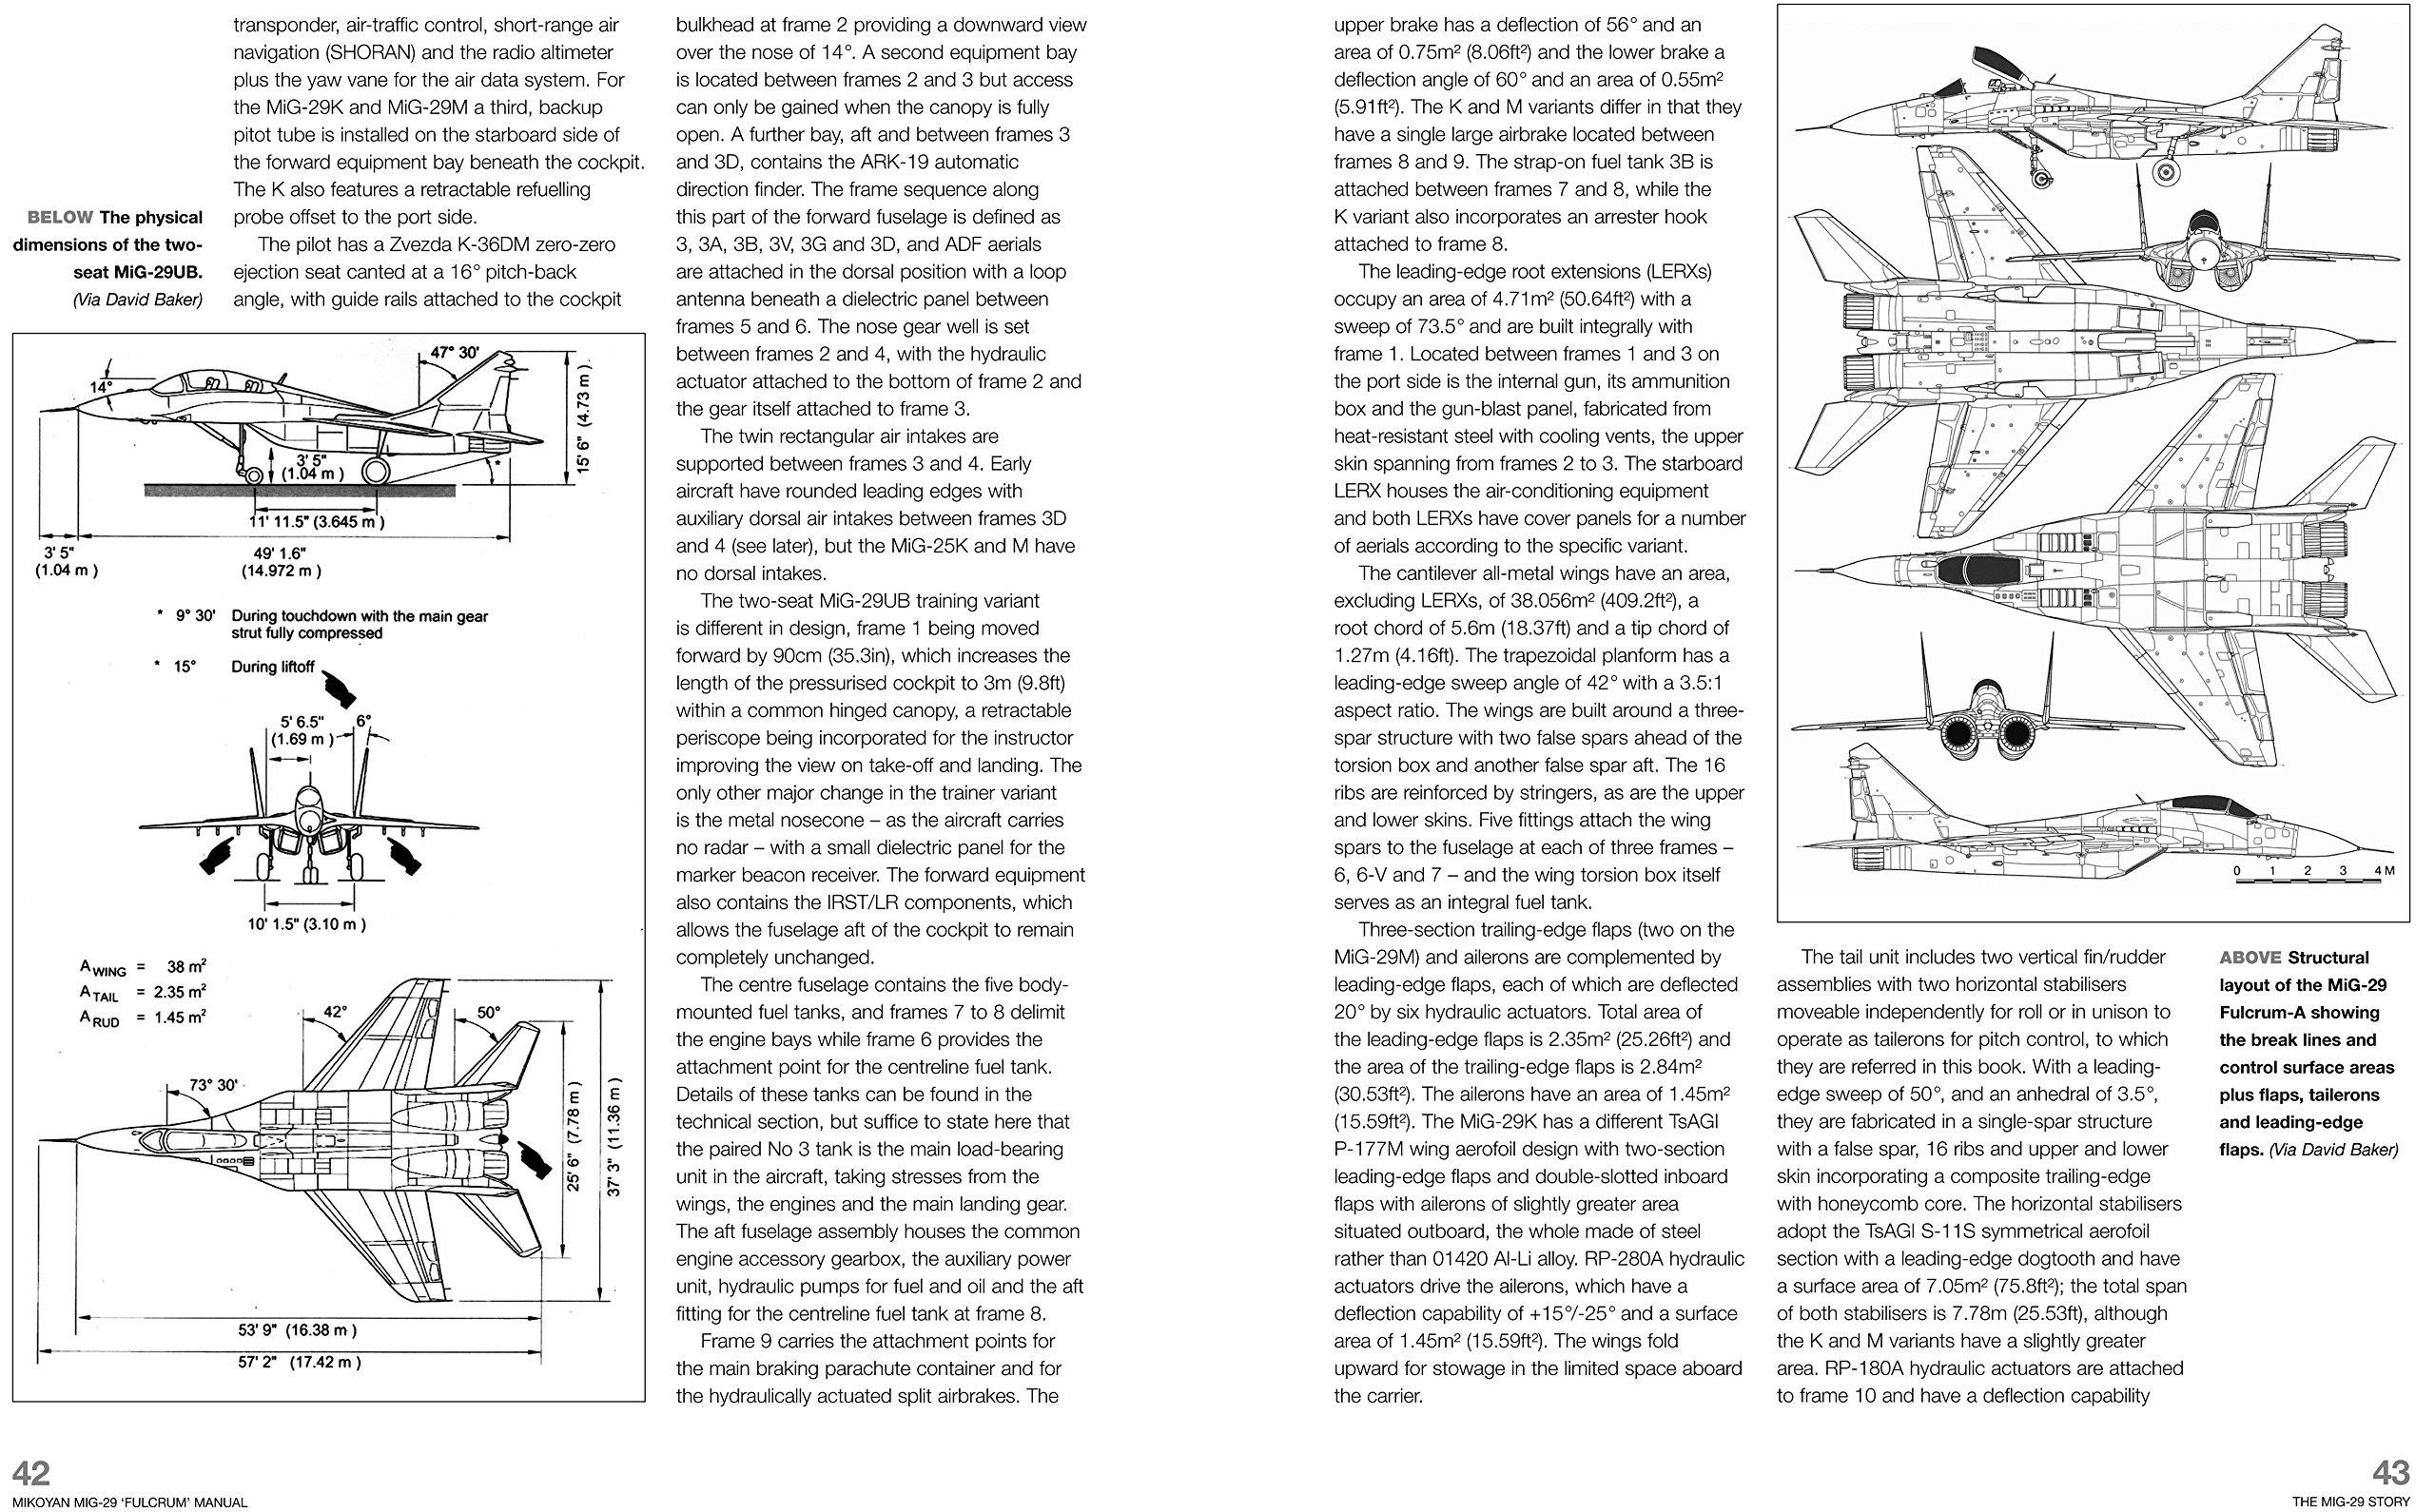 Mikoyan Mig 29 Fulcrum Manual 1981 To Present Owners Workshop Airsuperiority Weekly Digital Timer Circuit David Baker 9780857333971 Books